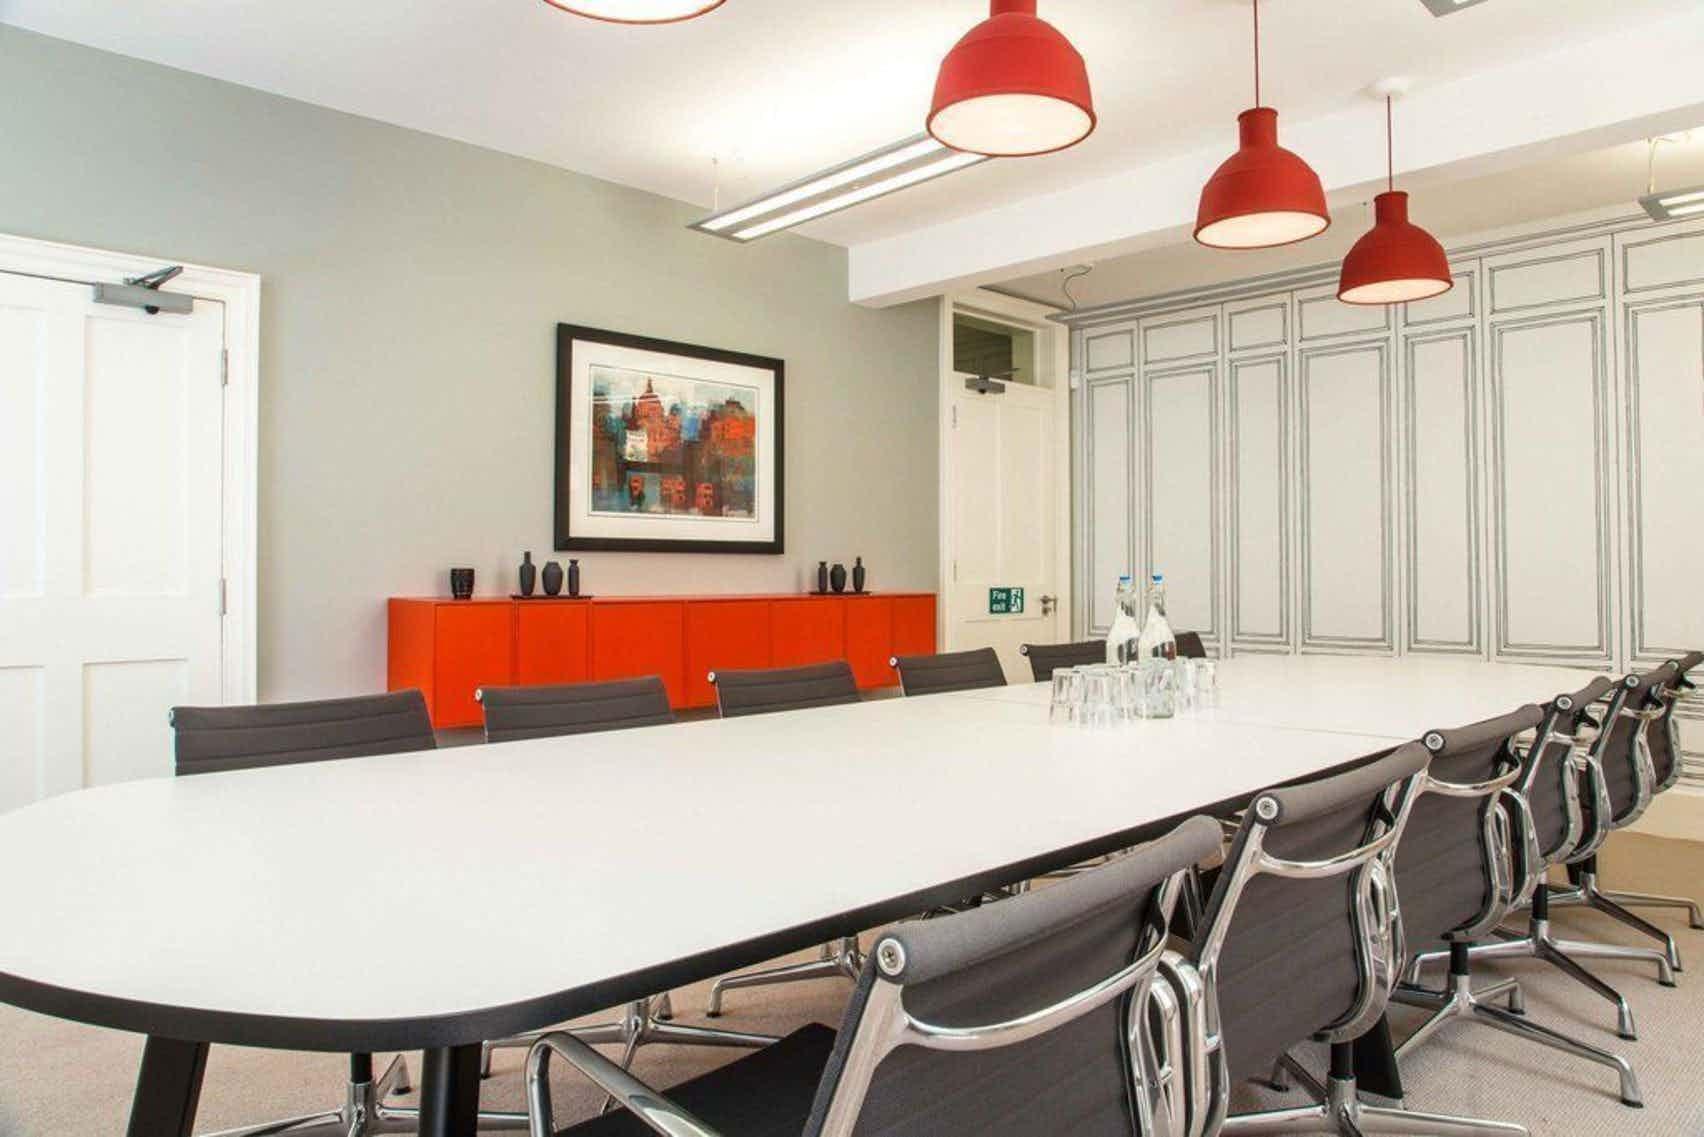 Bedford Square Boardroom, Twenty-Seven Bedford Square